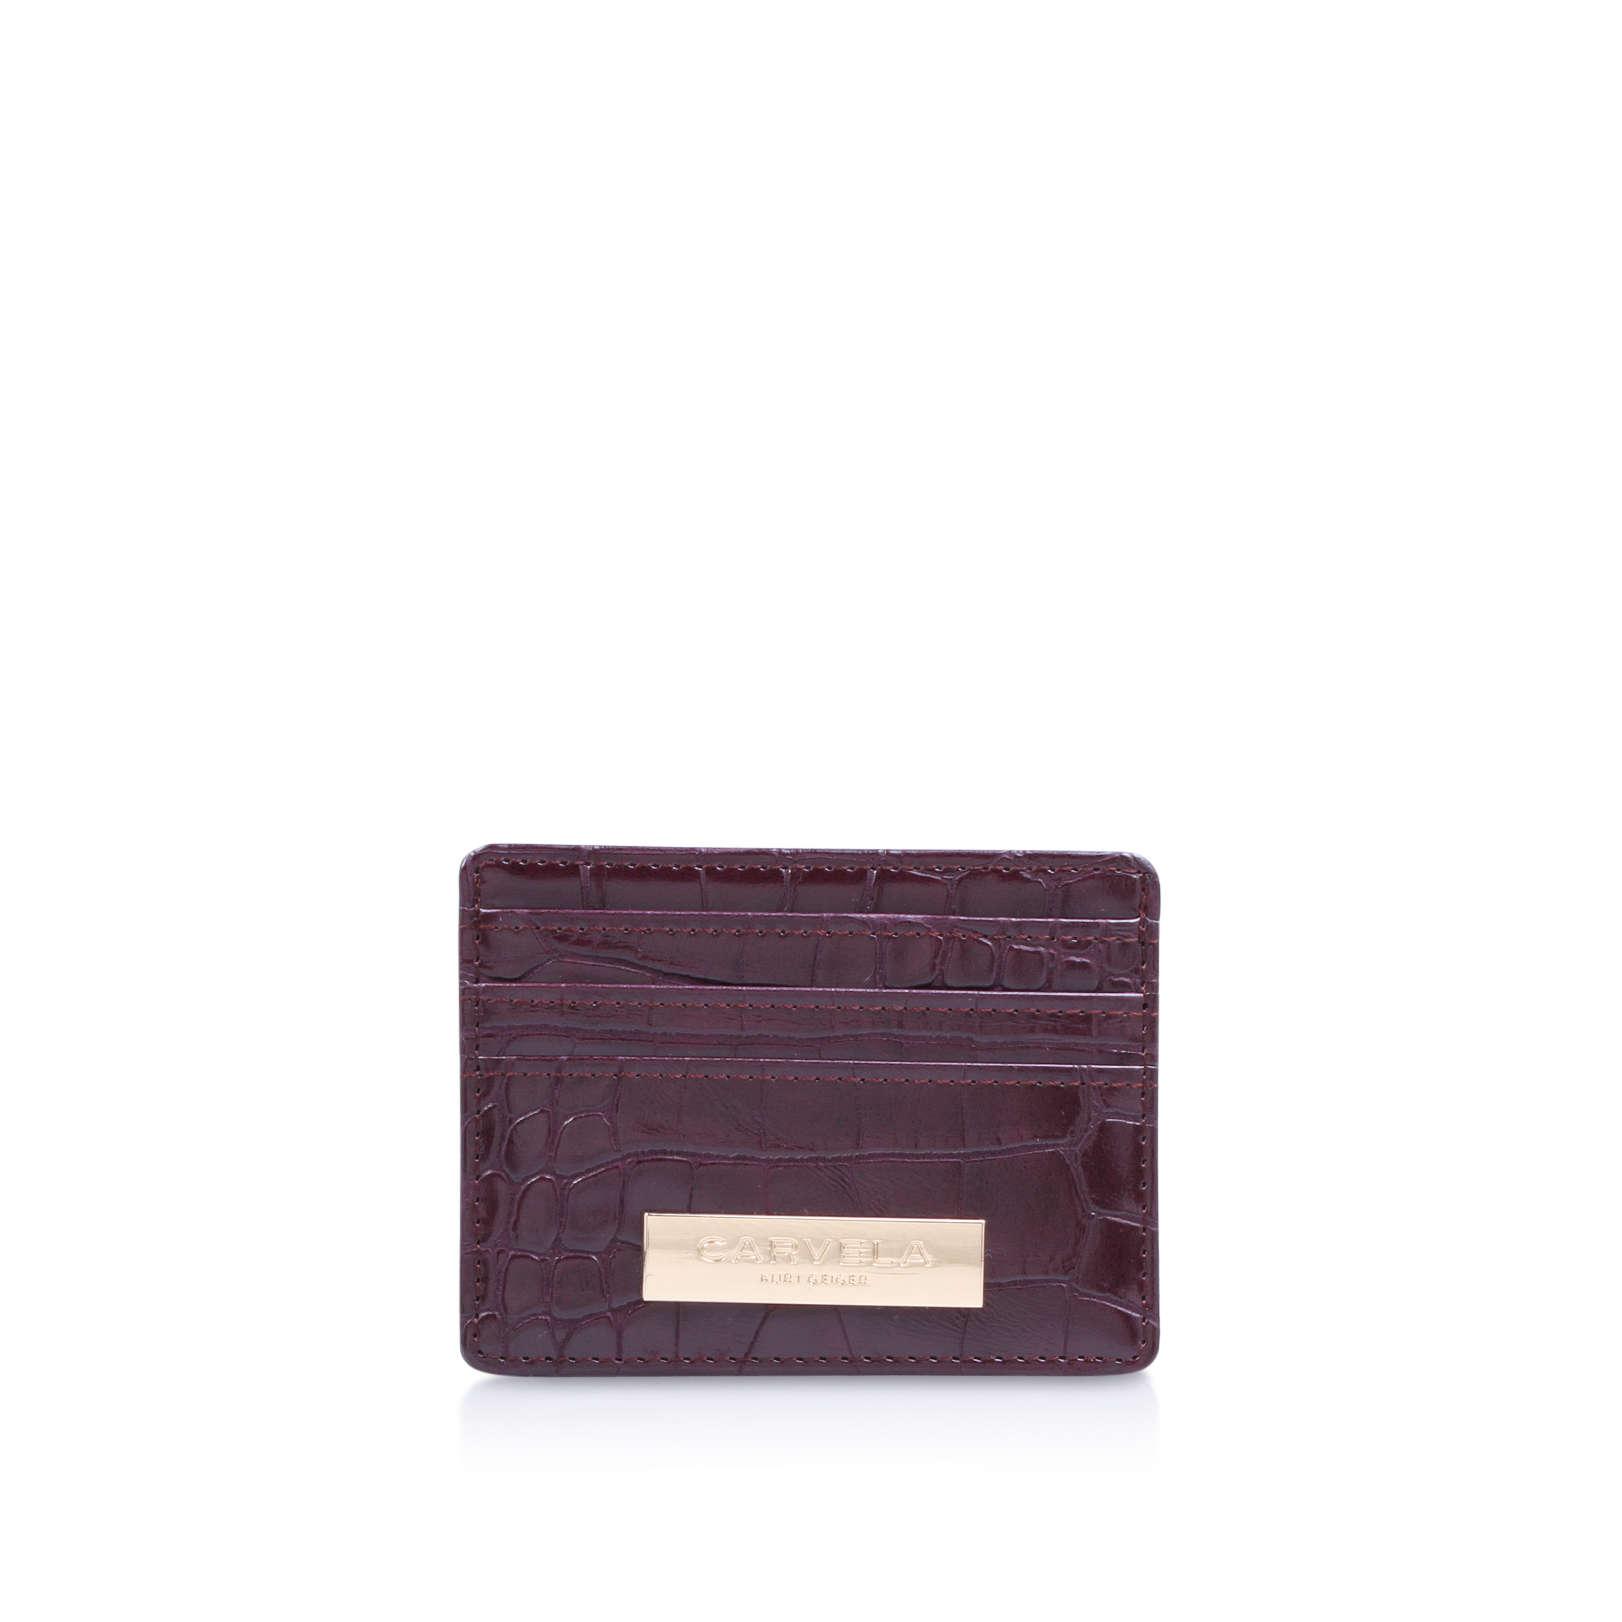 SHALI CARD HOLDER